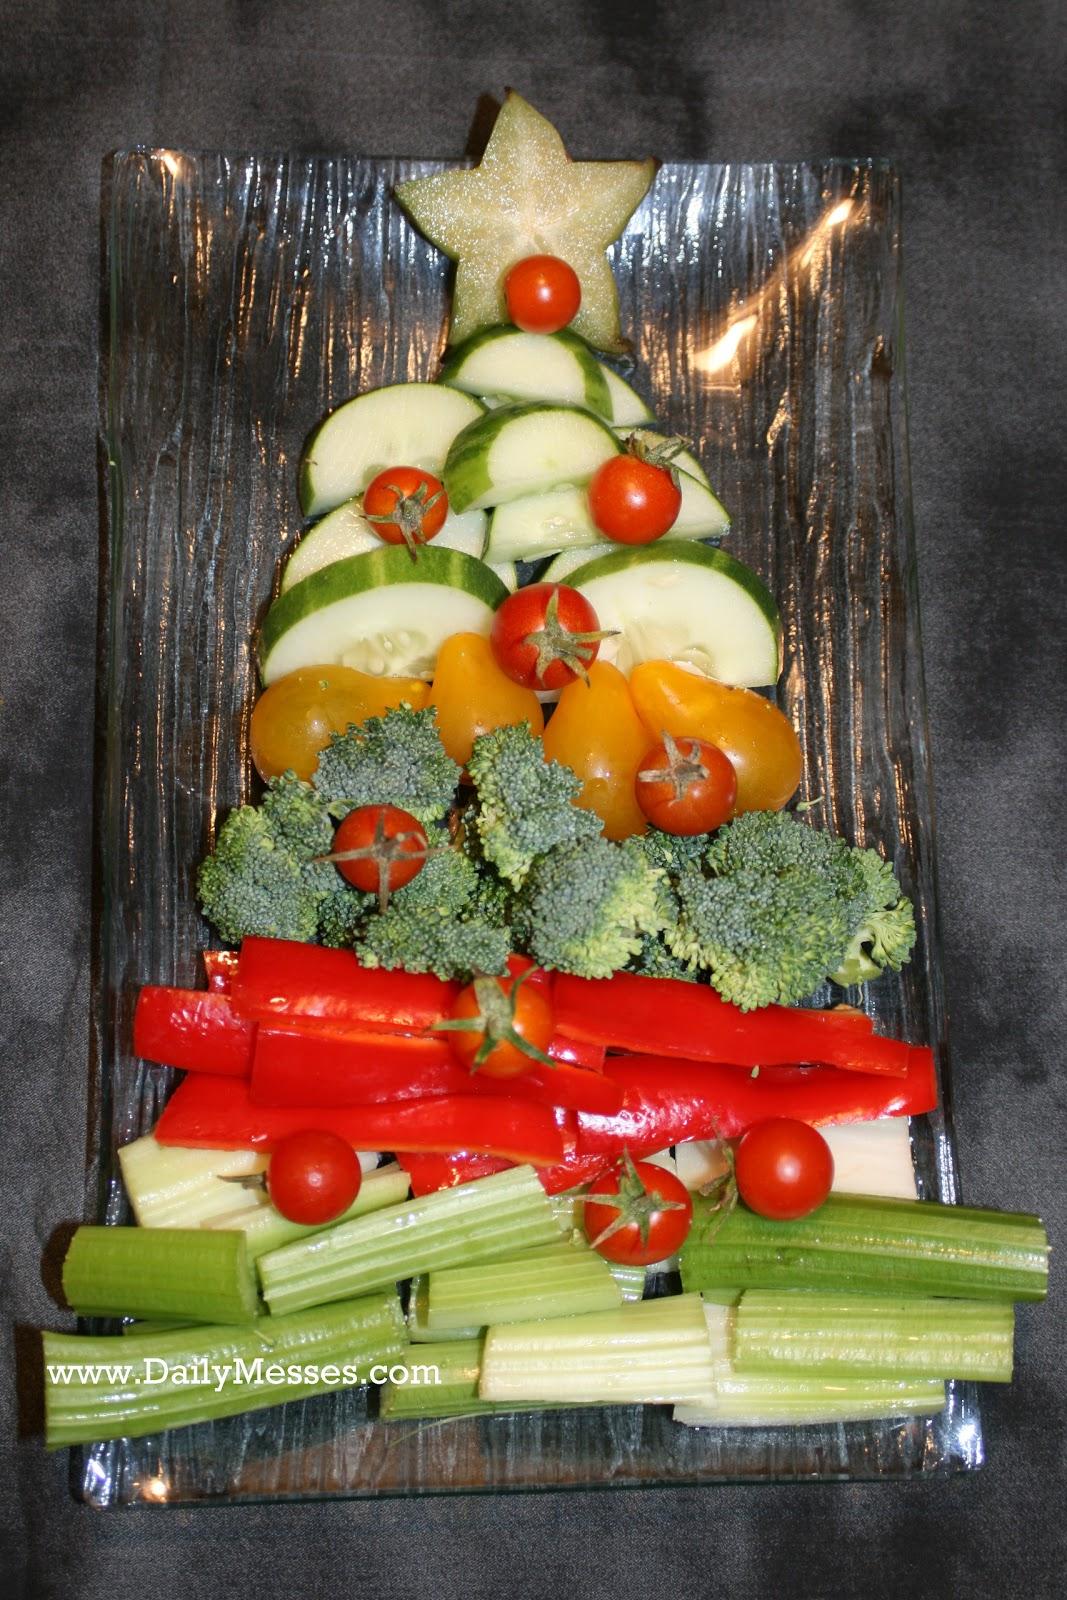 Christmas Tree Veggie Tray.Daily Messes Christmas Tree Veggie Tray